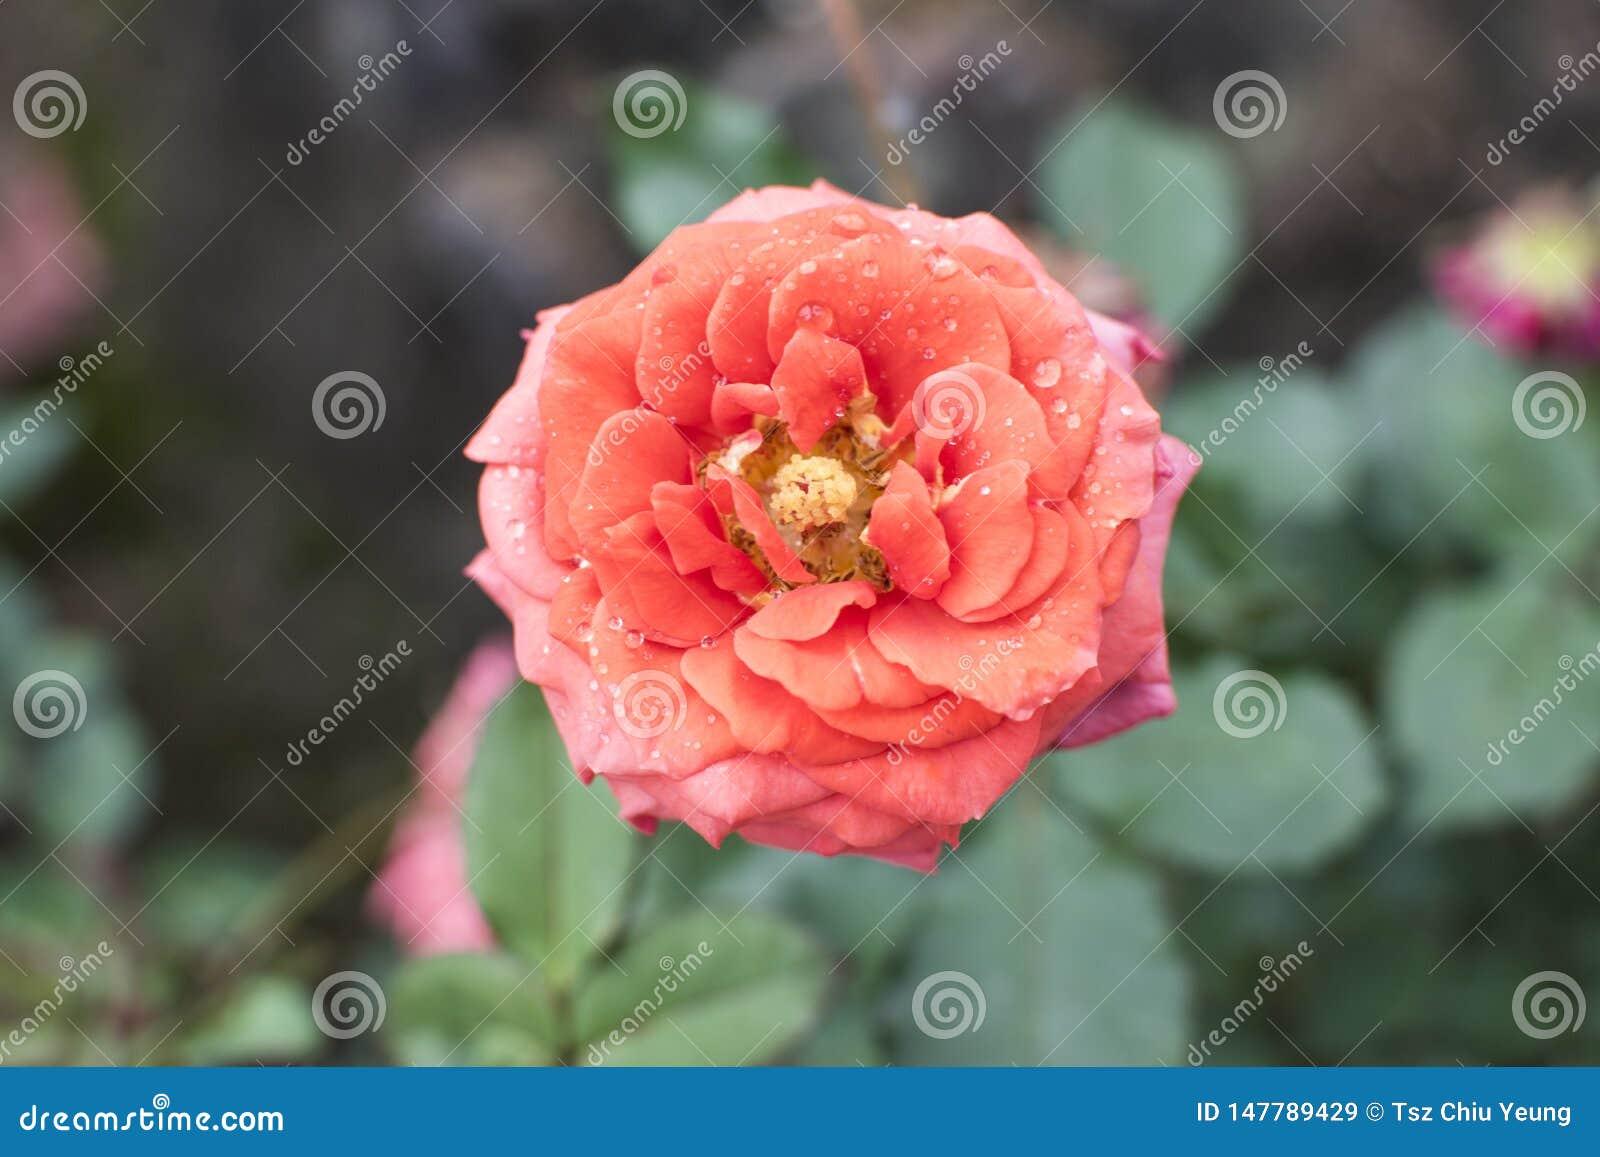 Beautiful stand alone pink flower